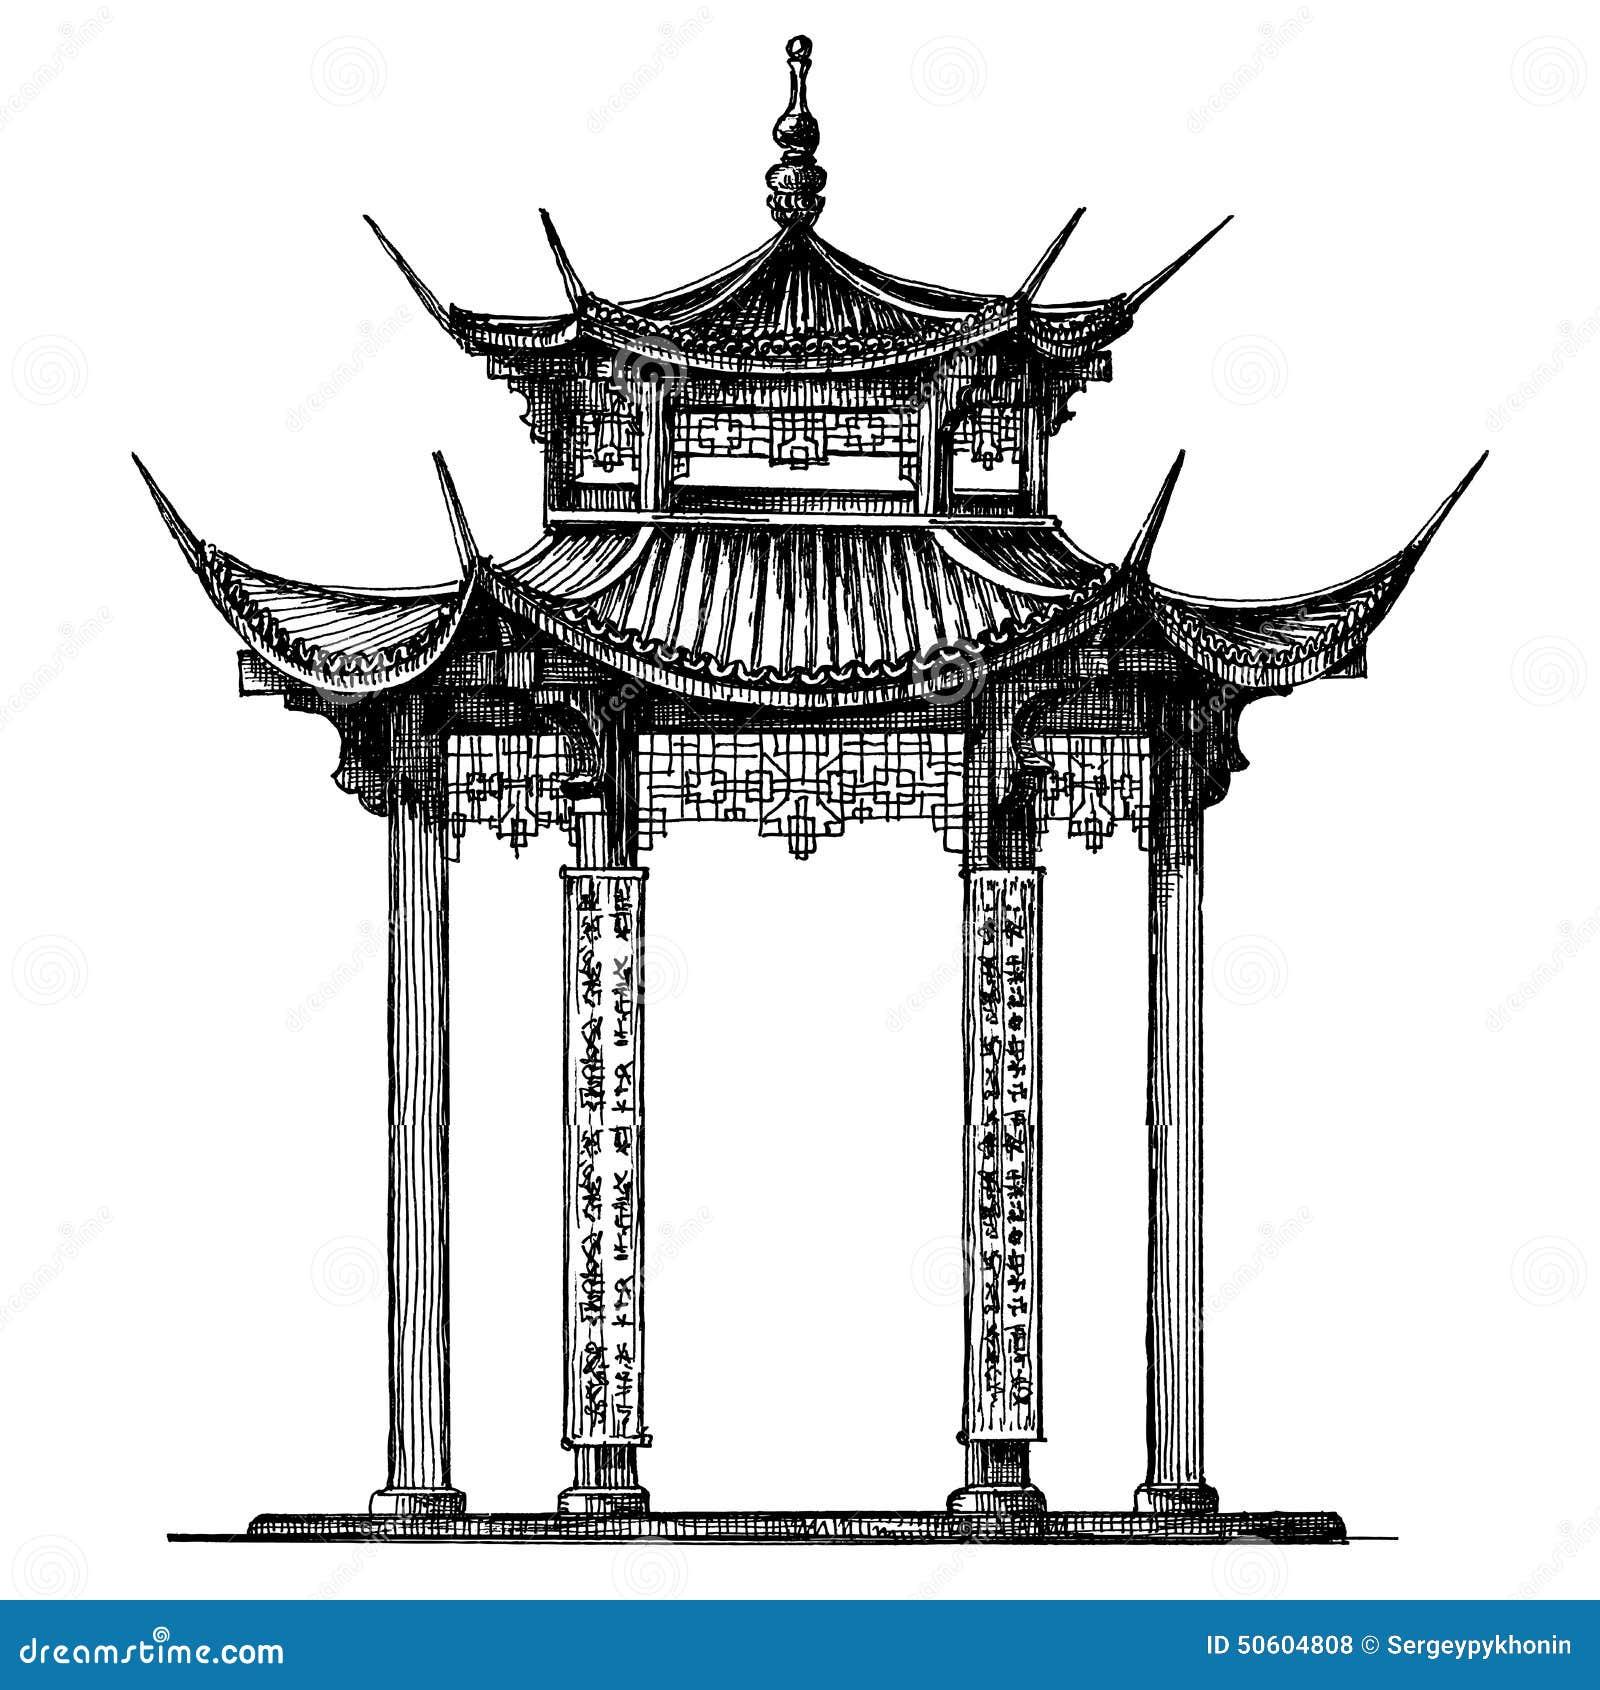 Asia Korea Japan China. Religious Architecture Stock Illustration - Image 50604808